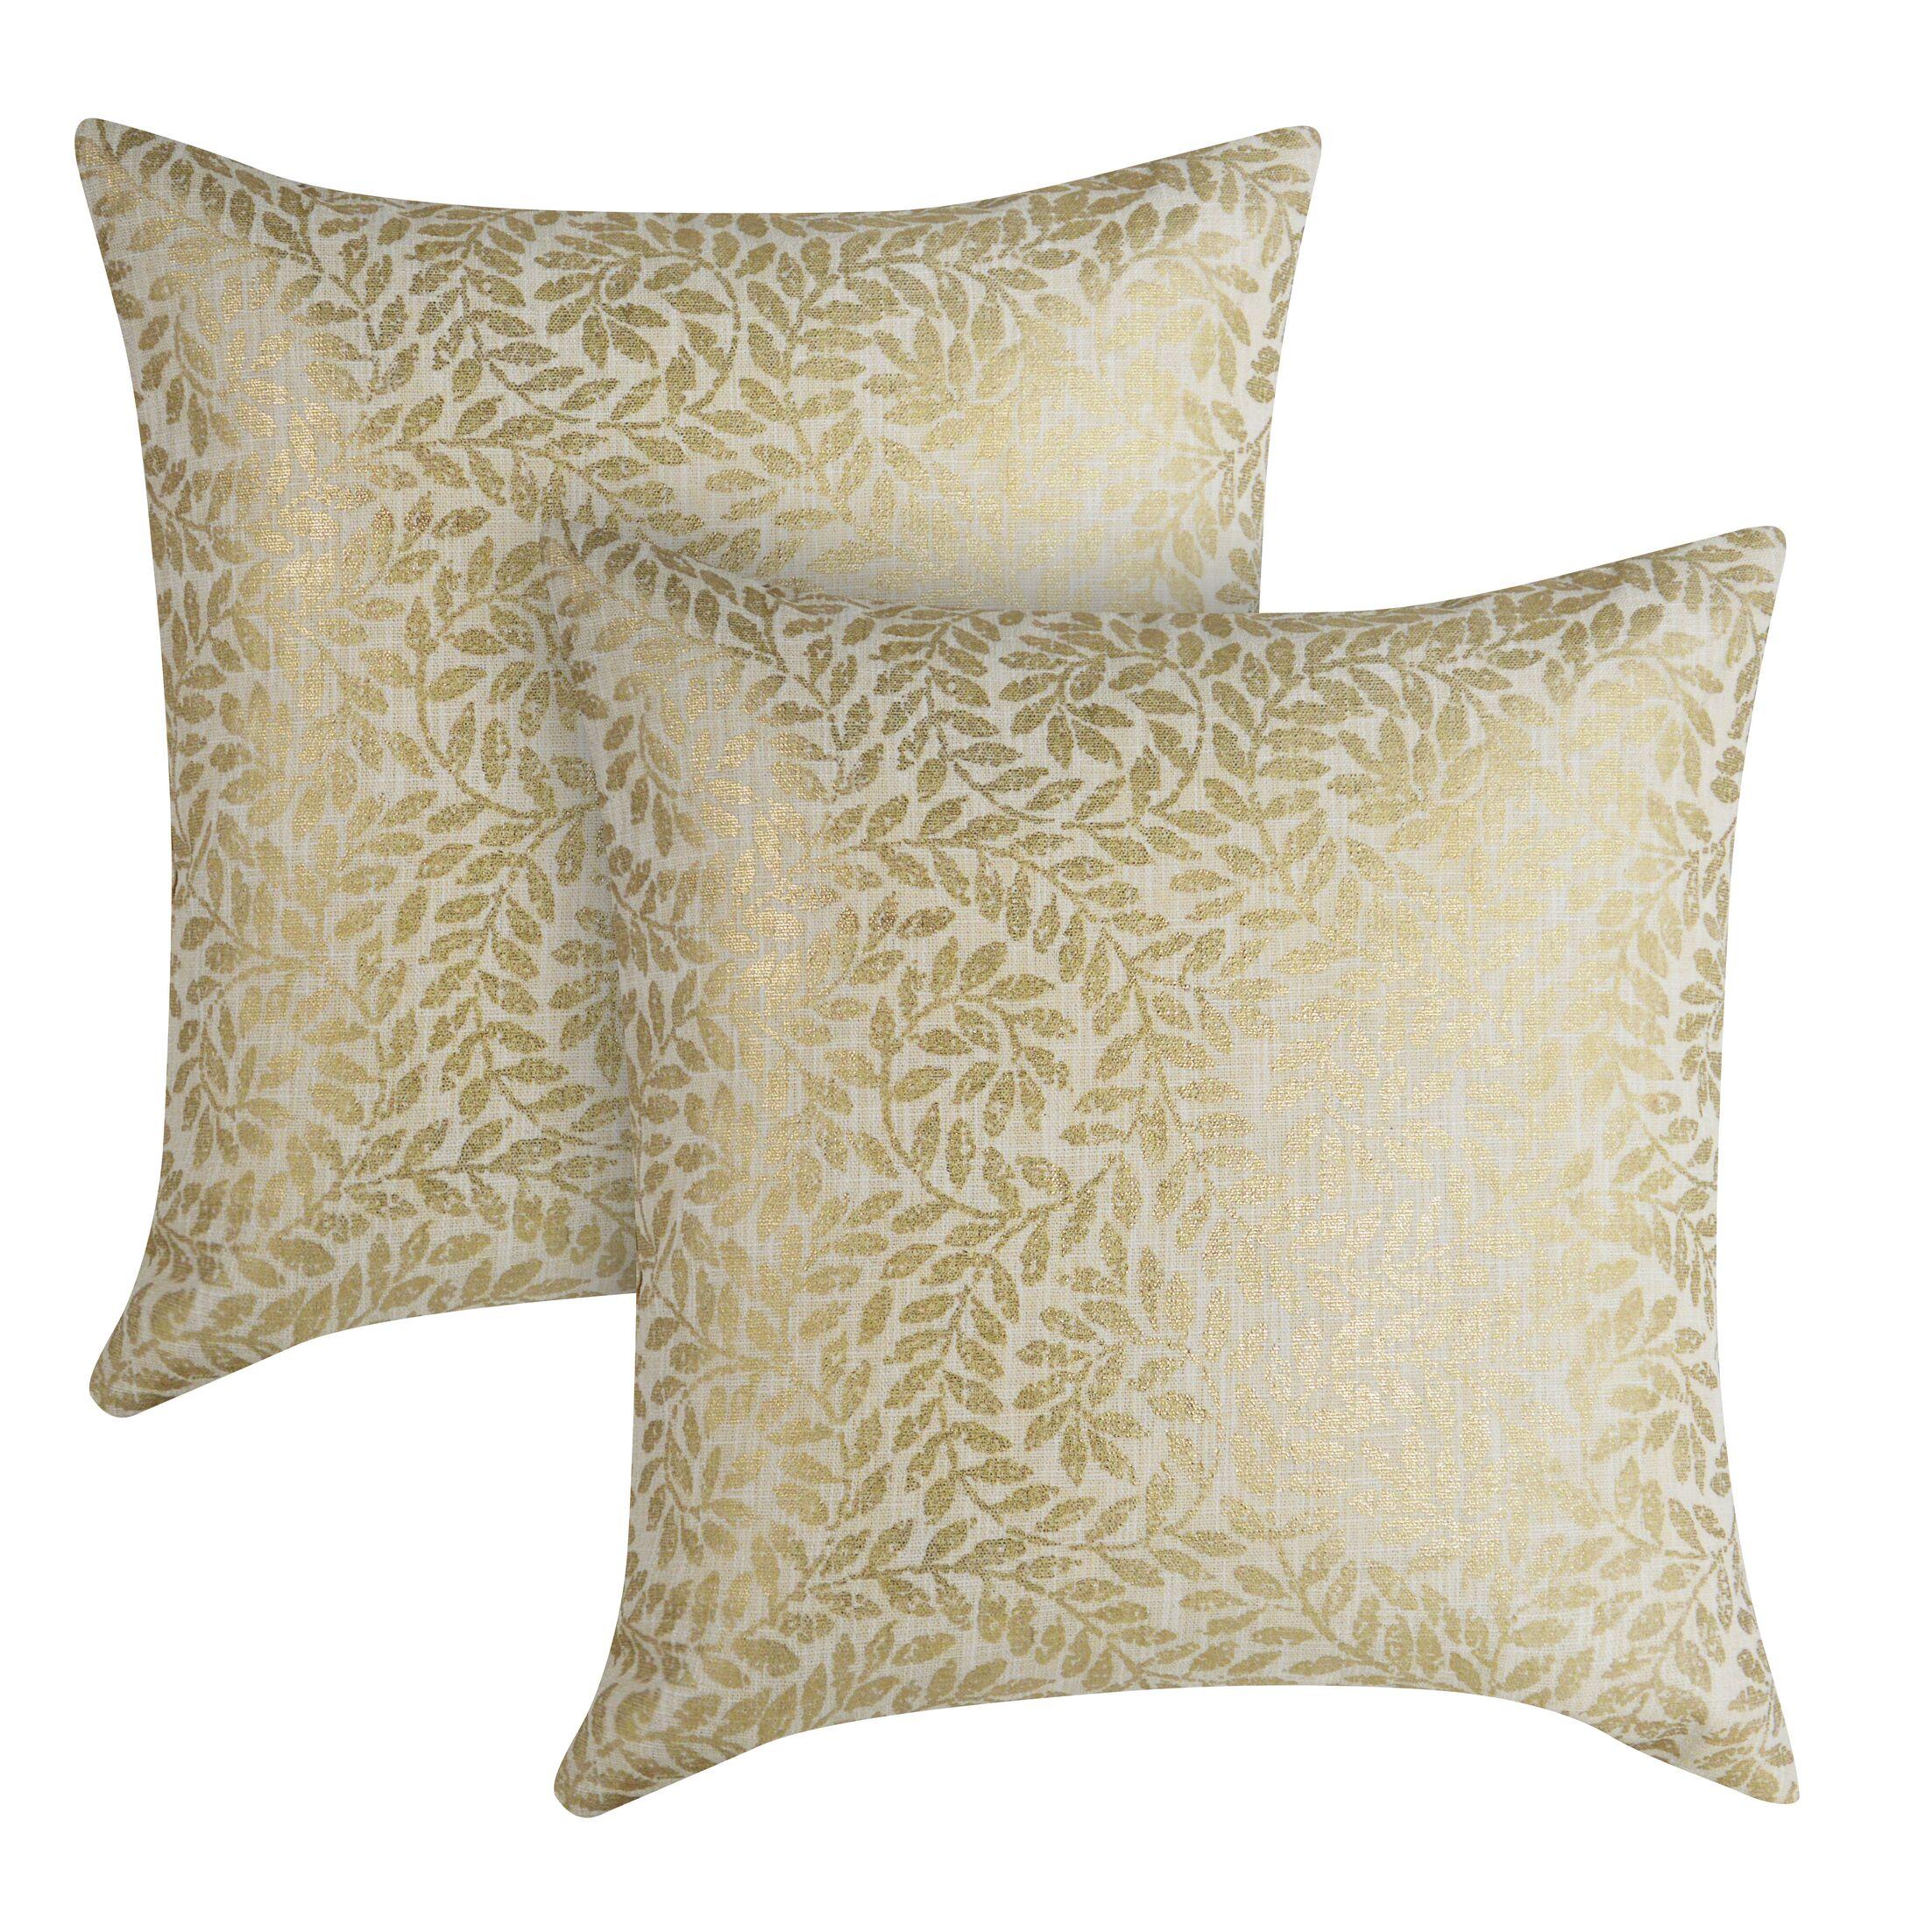 Foil Printed Throw Pillow